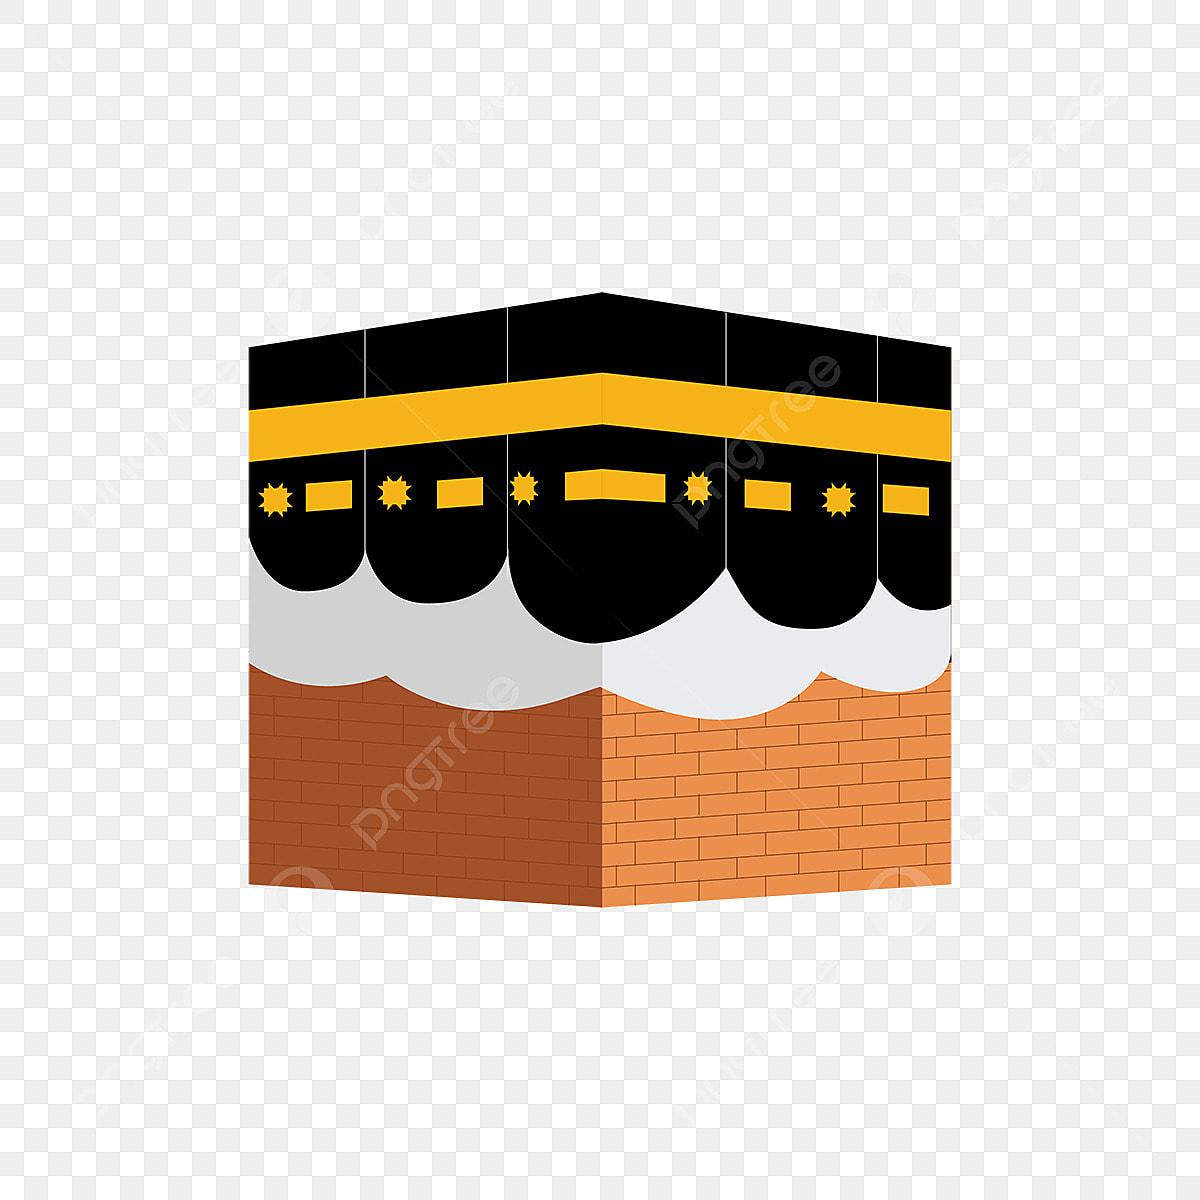 kabah building flat building icons kaaba makkah png transparent clipart image and psd file for free download https pngtree com freepng kabah building flat 4246324 html